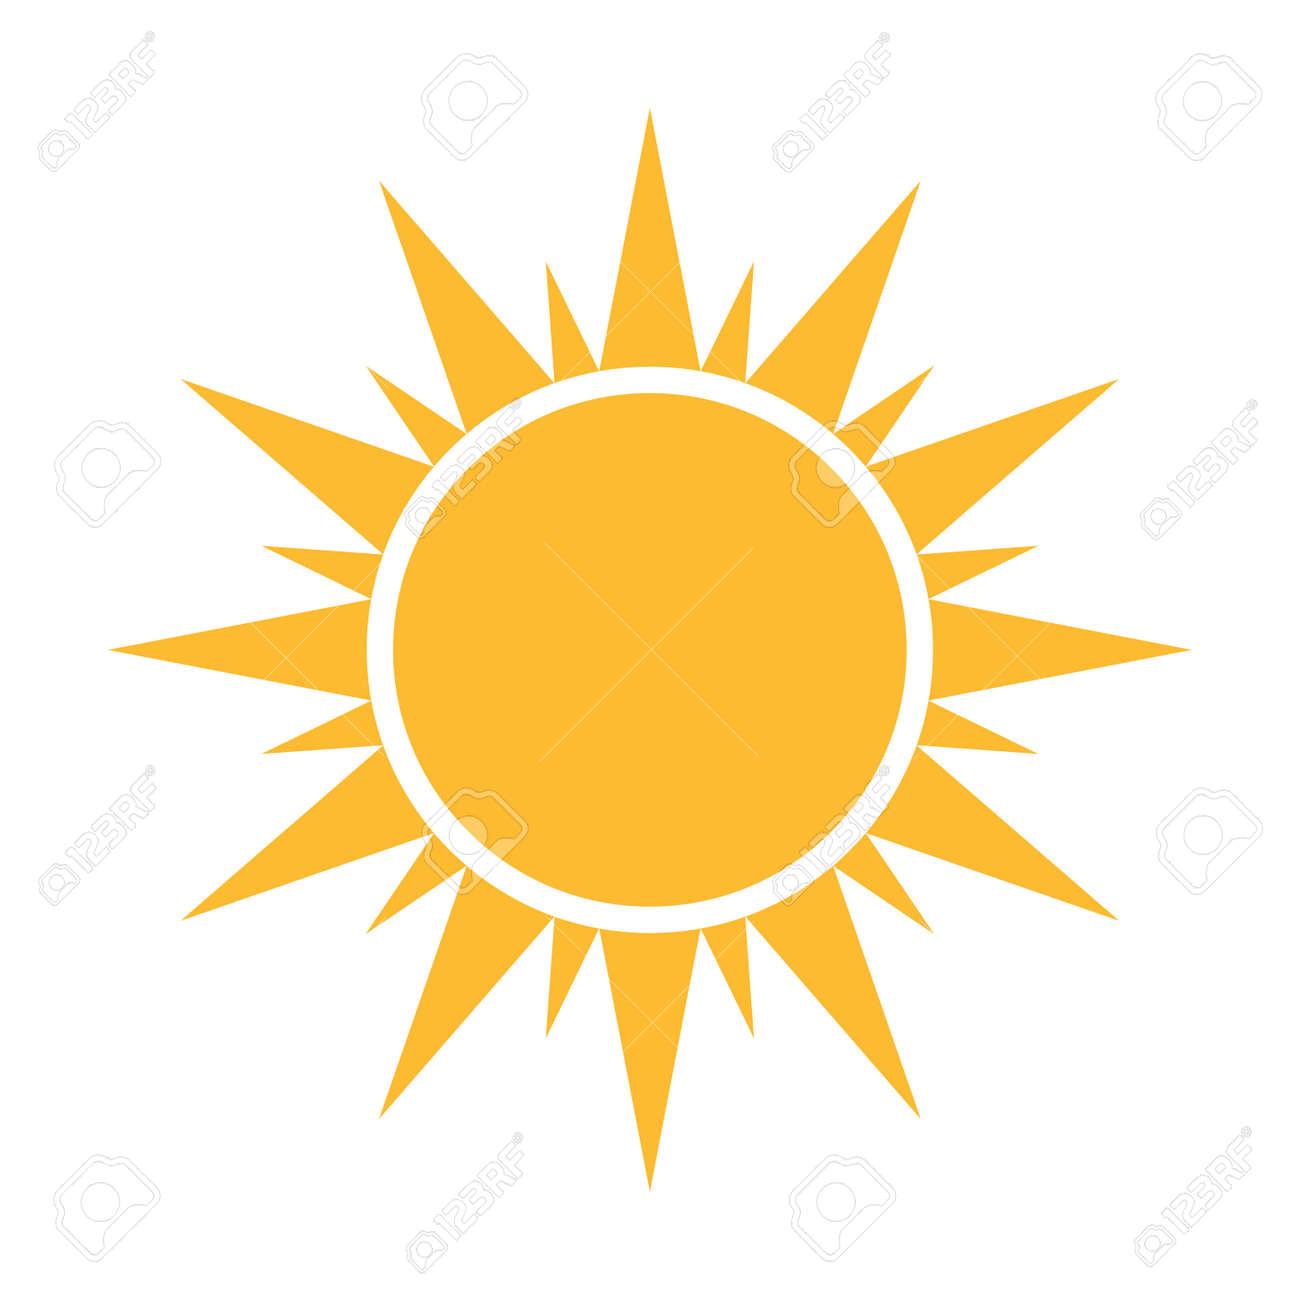 Sun flat icon vector. Summer pictogram. Sunlight symbol. for website design, web button, mobile app illustration - 169916565